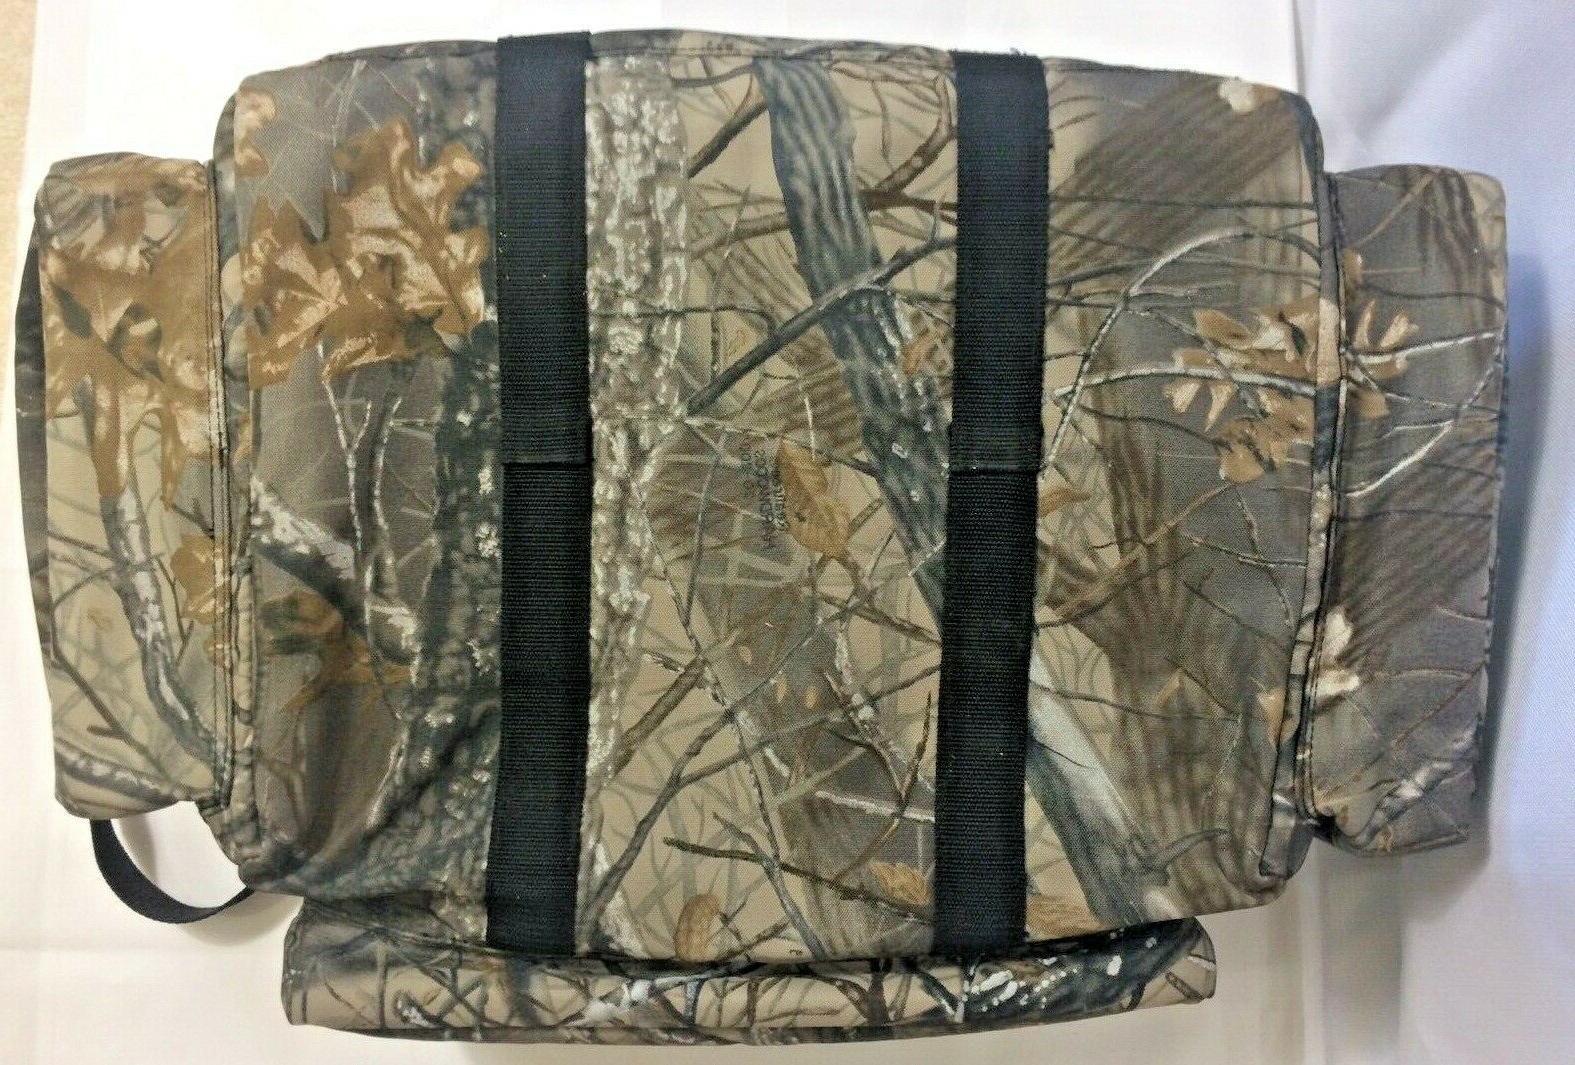 NEW Avery Bag Realtree Camo NAHC Big Pack